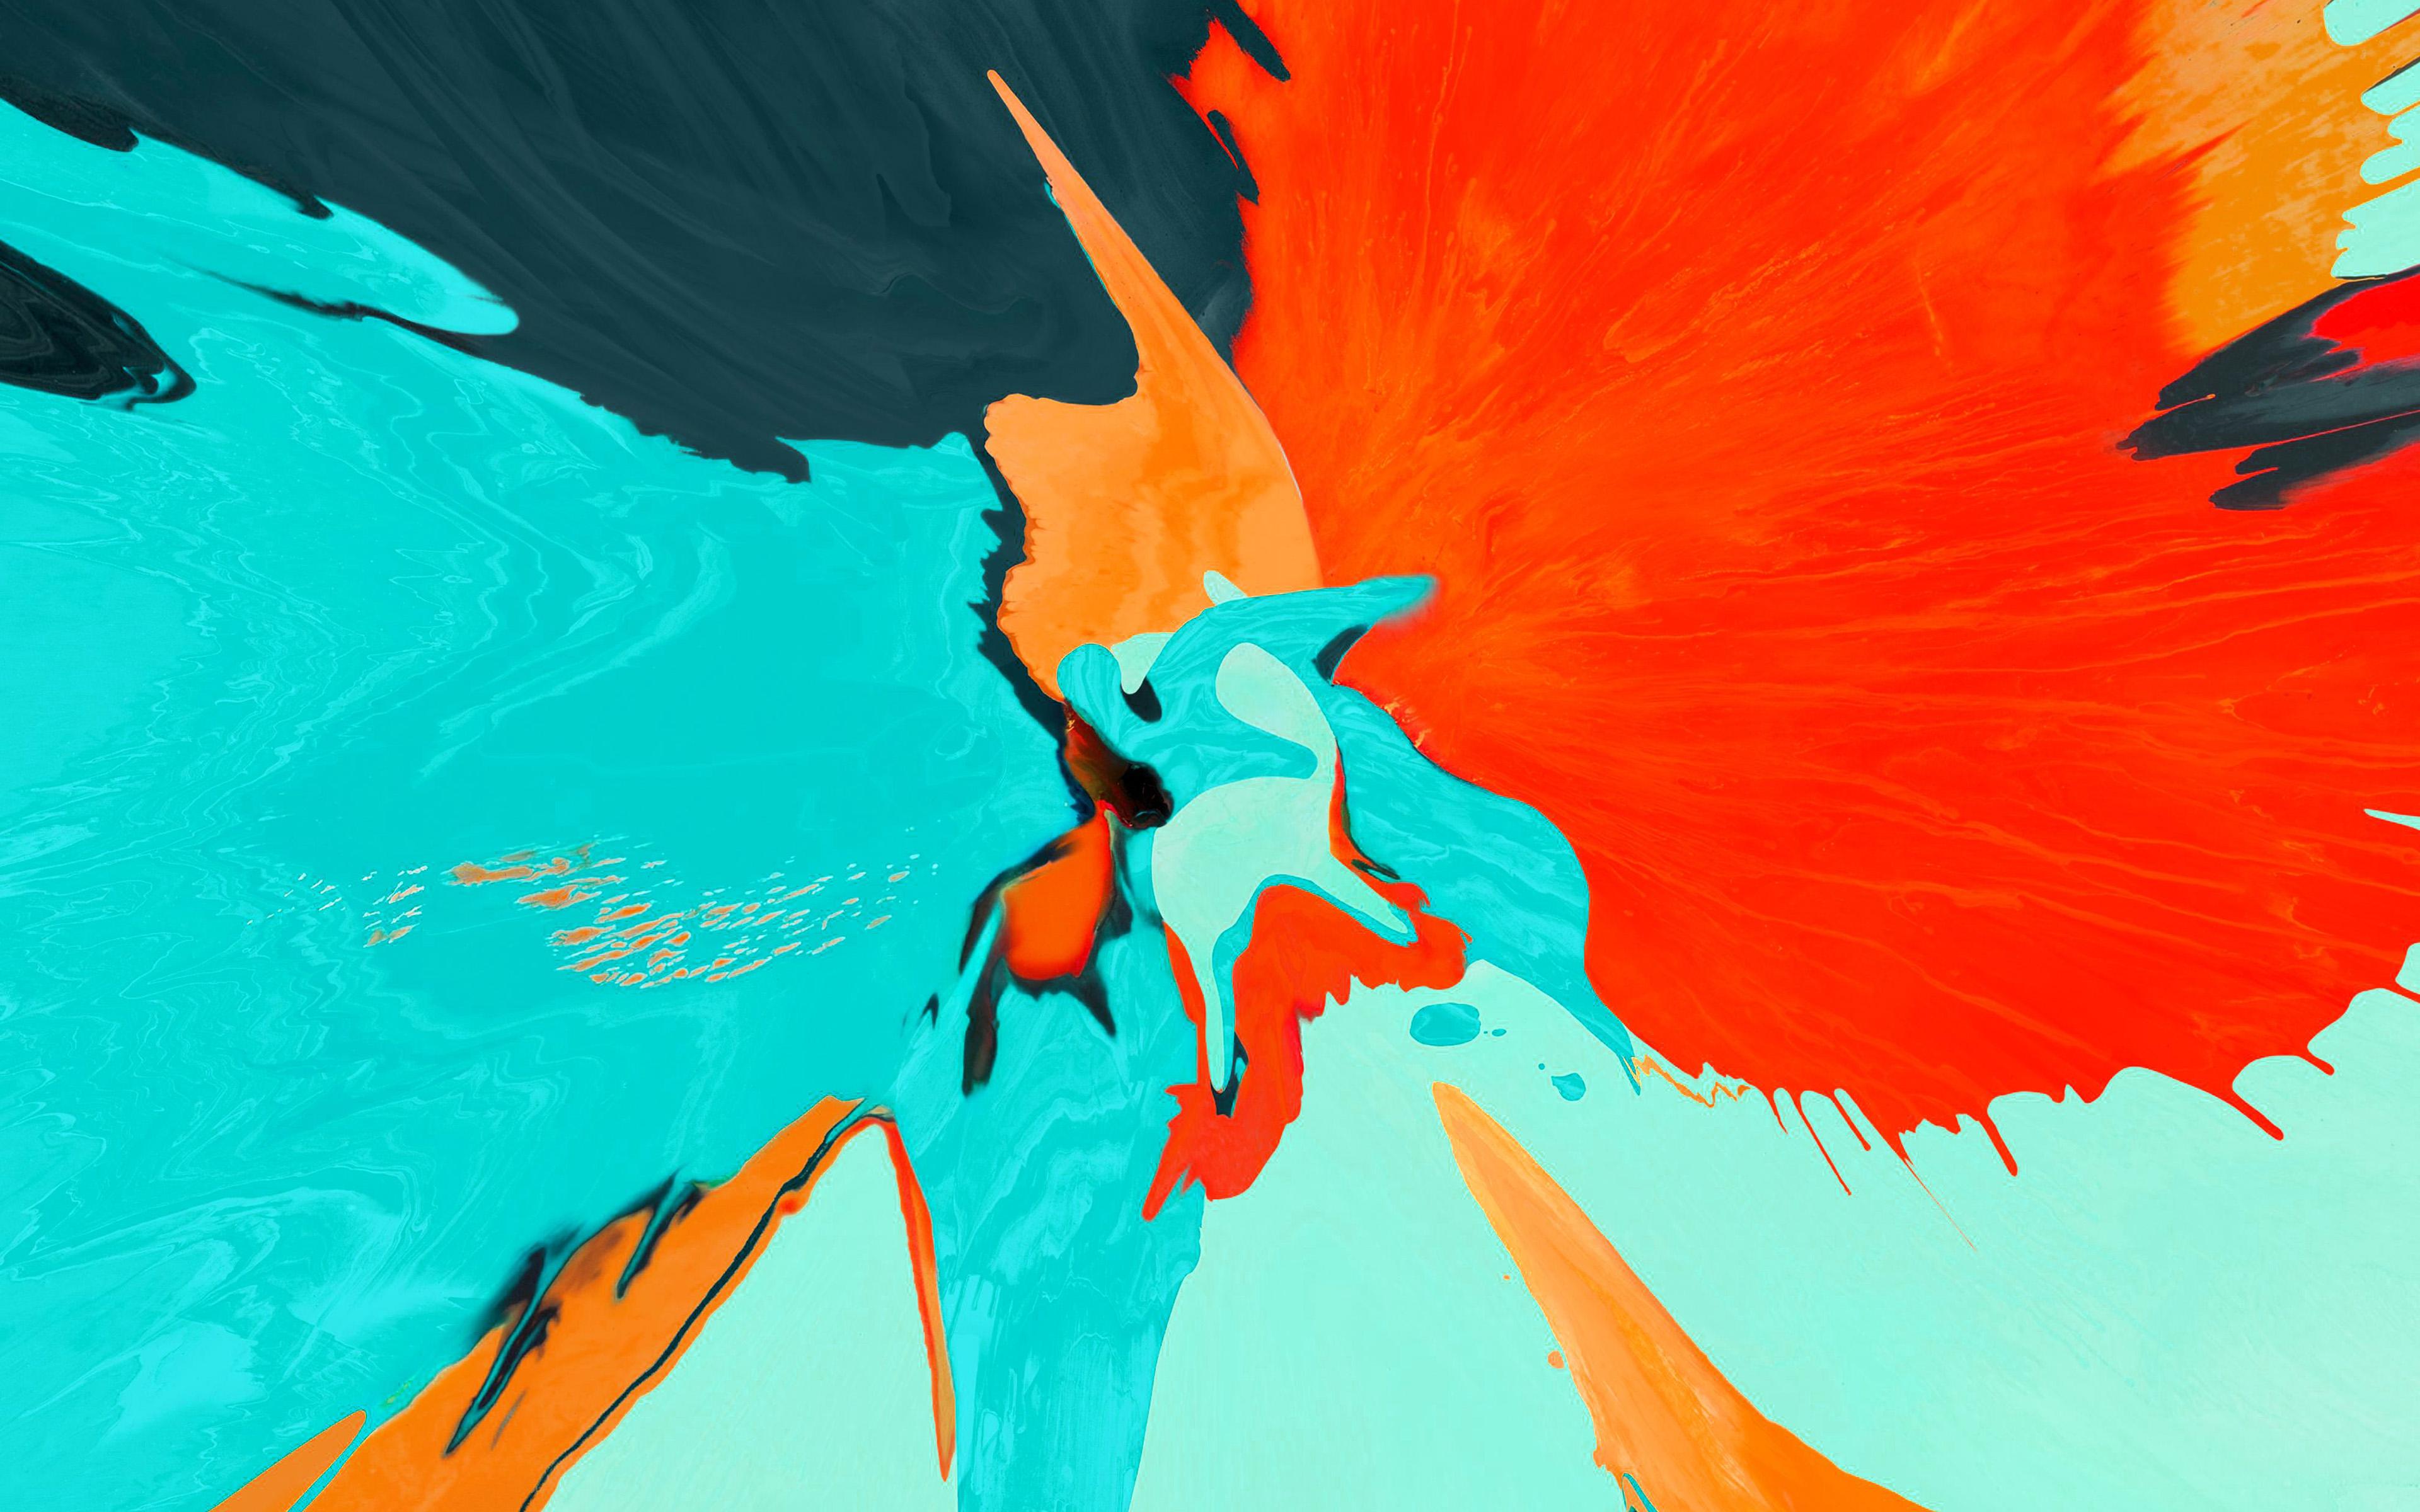 Bg70 Apple Paint Orange Ipad Pro Art Color Wallpaper